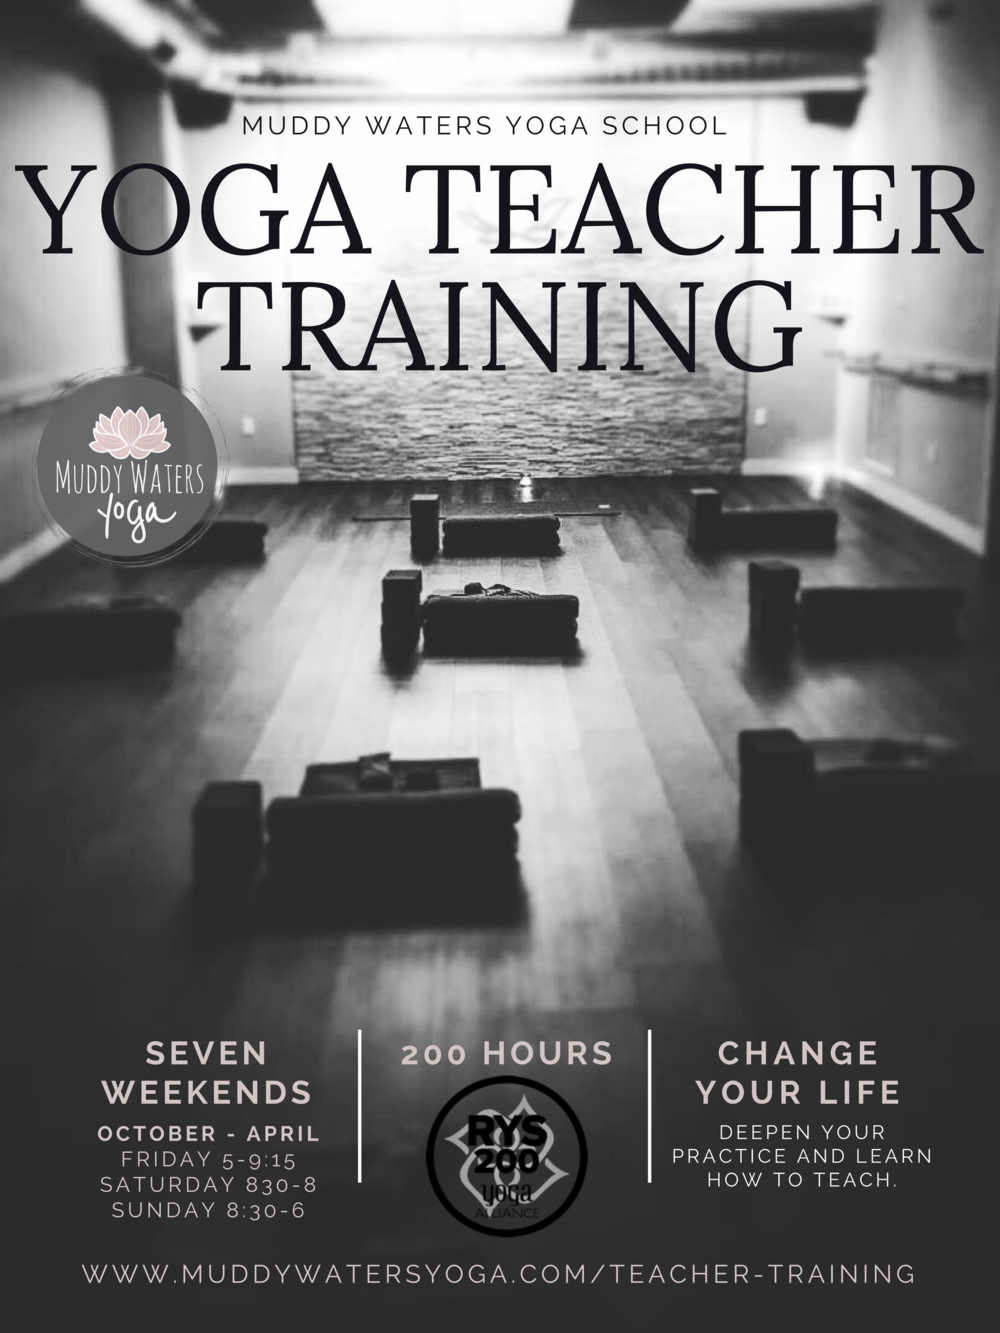 Copy of yoga teacher training.png